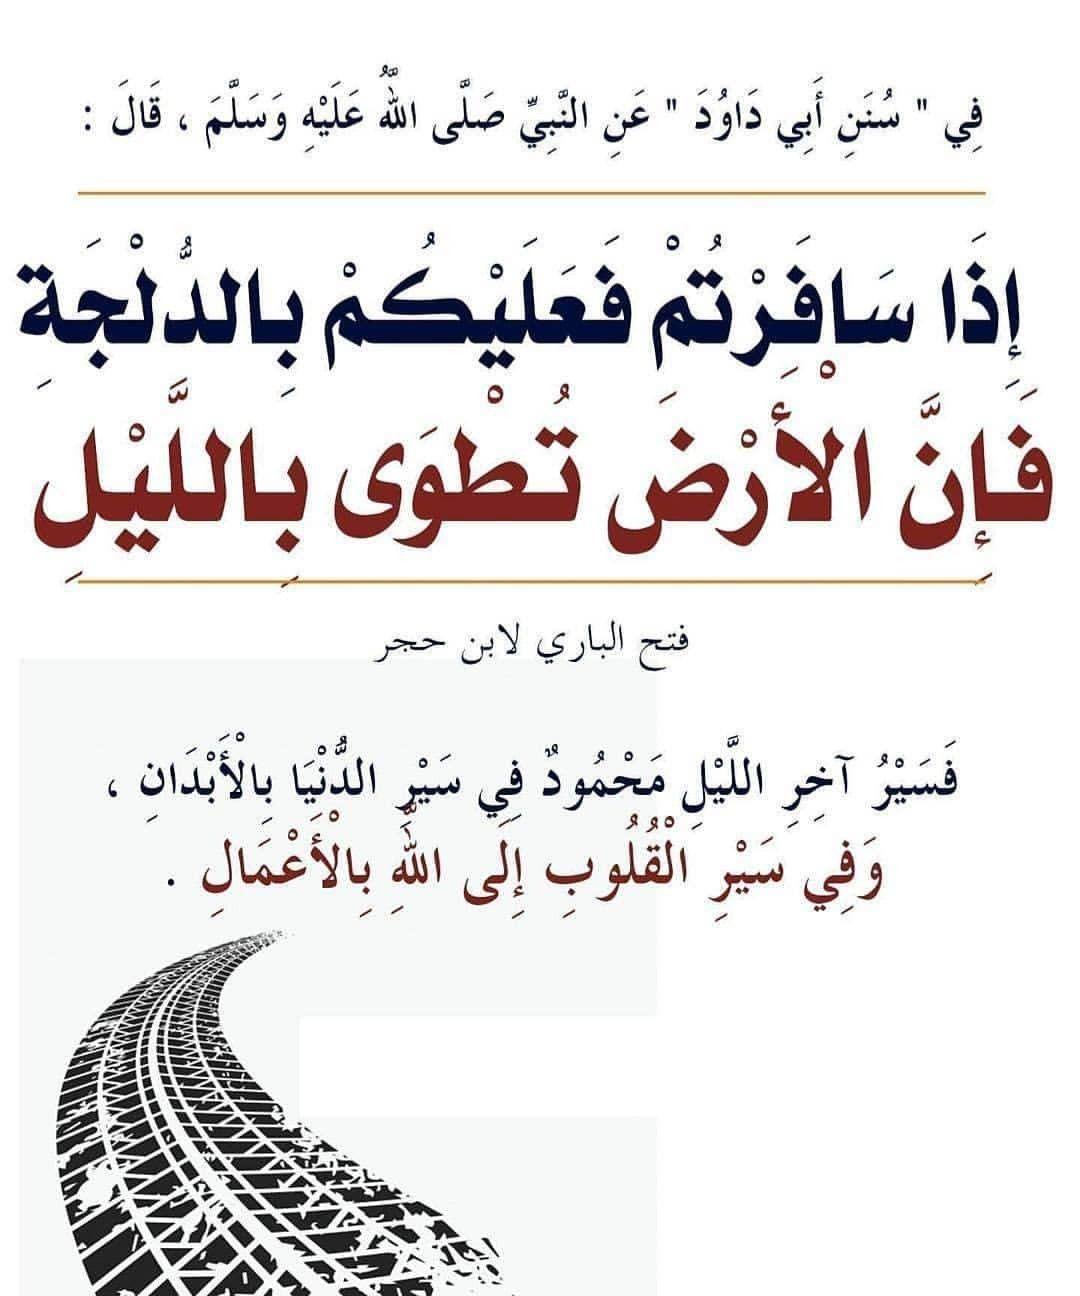 Pin By عبق الورد On أحاديث نبوية ١ Islamic Quotes Islam Facts Quotes